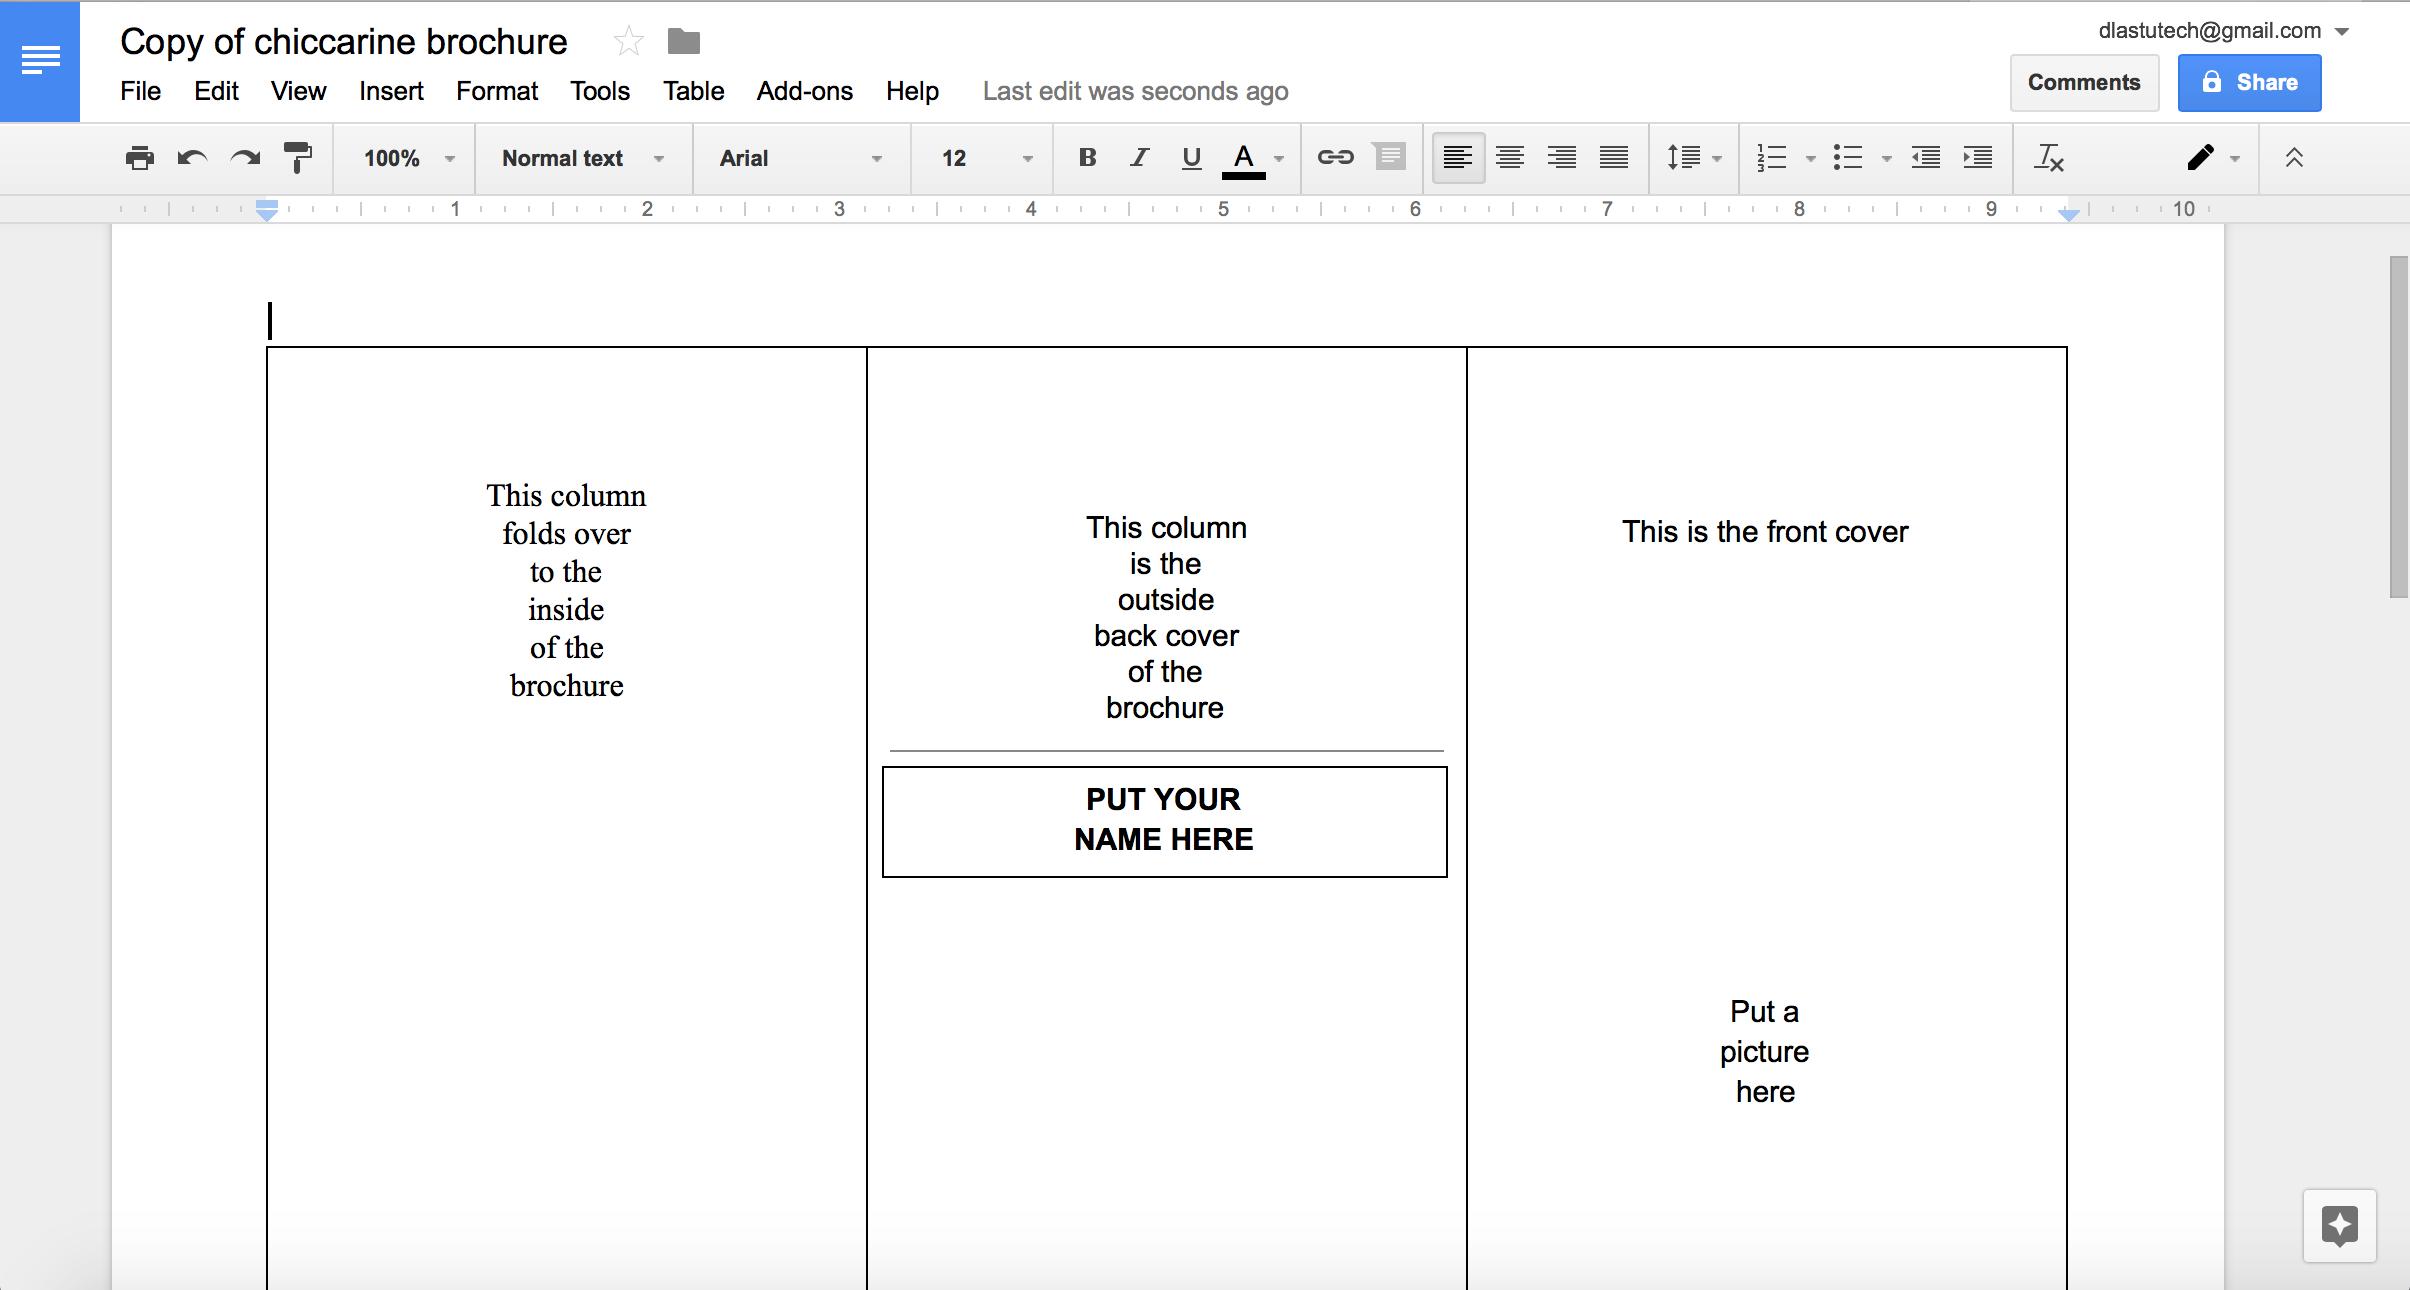 019 Blank Tri Fold Brochure Template Google Slides Ideas Inside Brochure Template For Google Docs